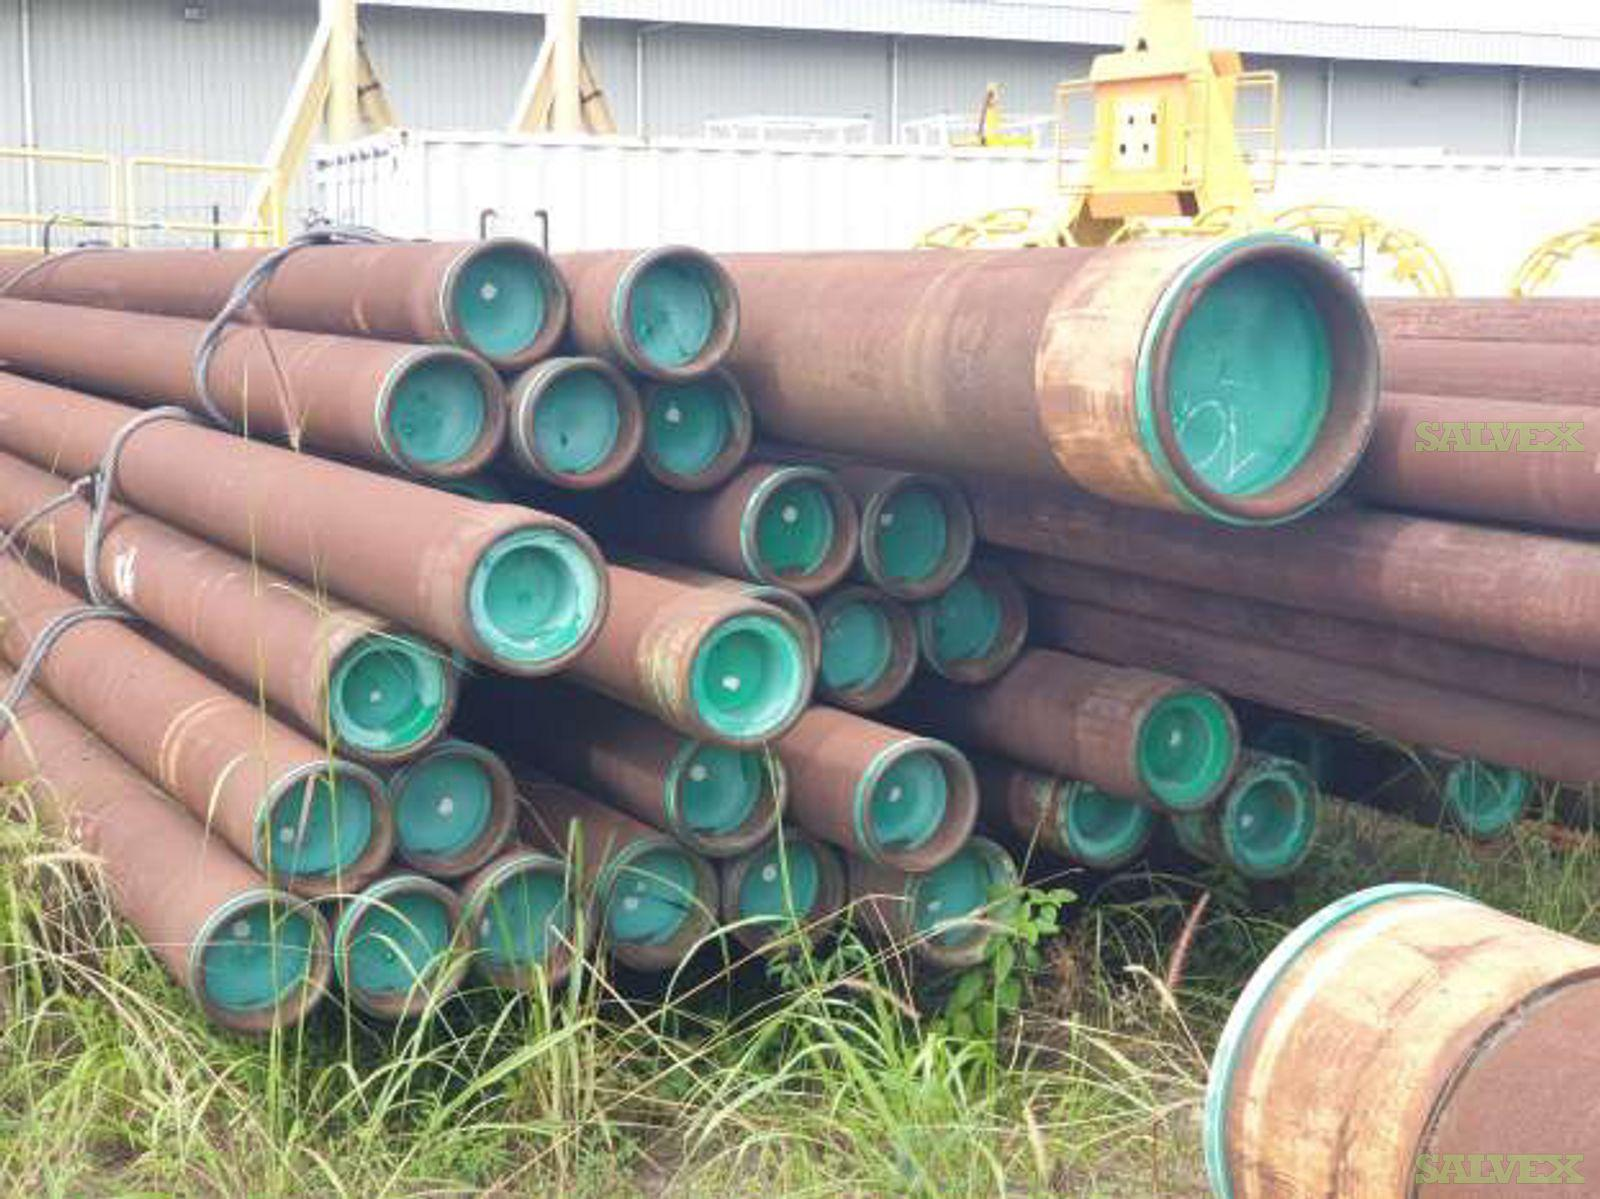 13 3/8 72# L80 SLX R3 Surplus Casing (1,080 Feet / 35 Metric Tons)